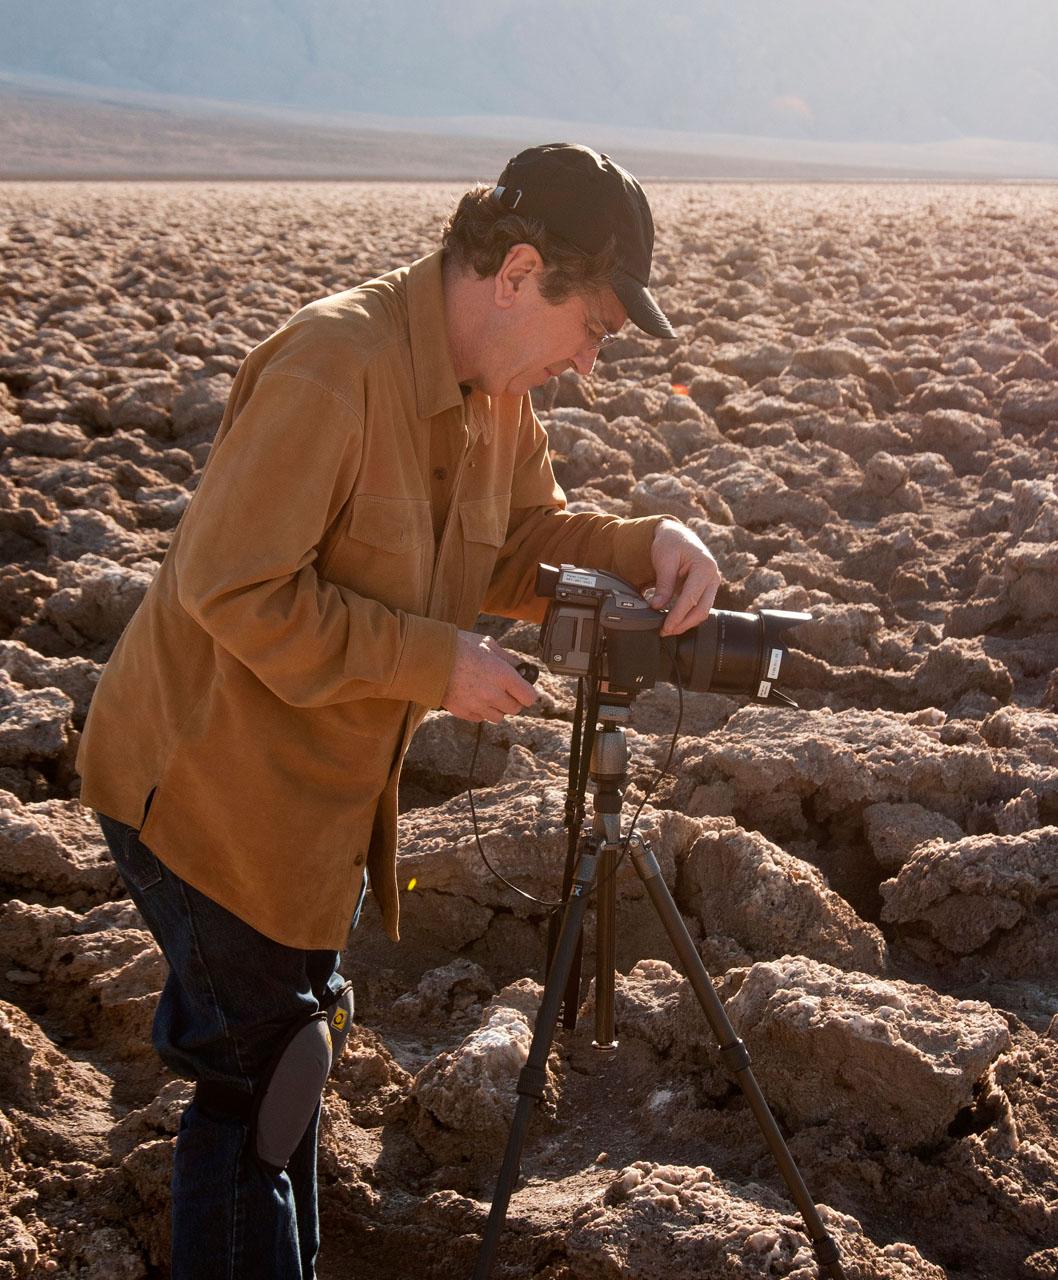 Death_Valley_2012_web_027.jpg